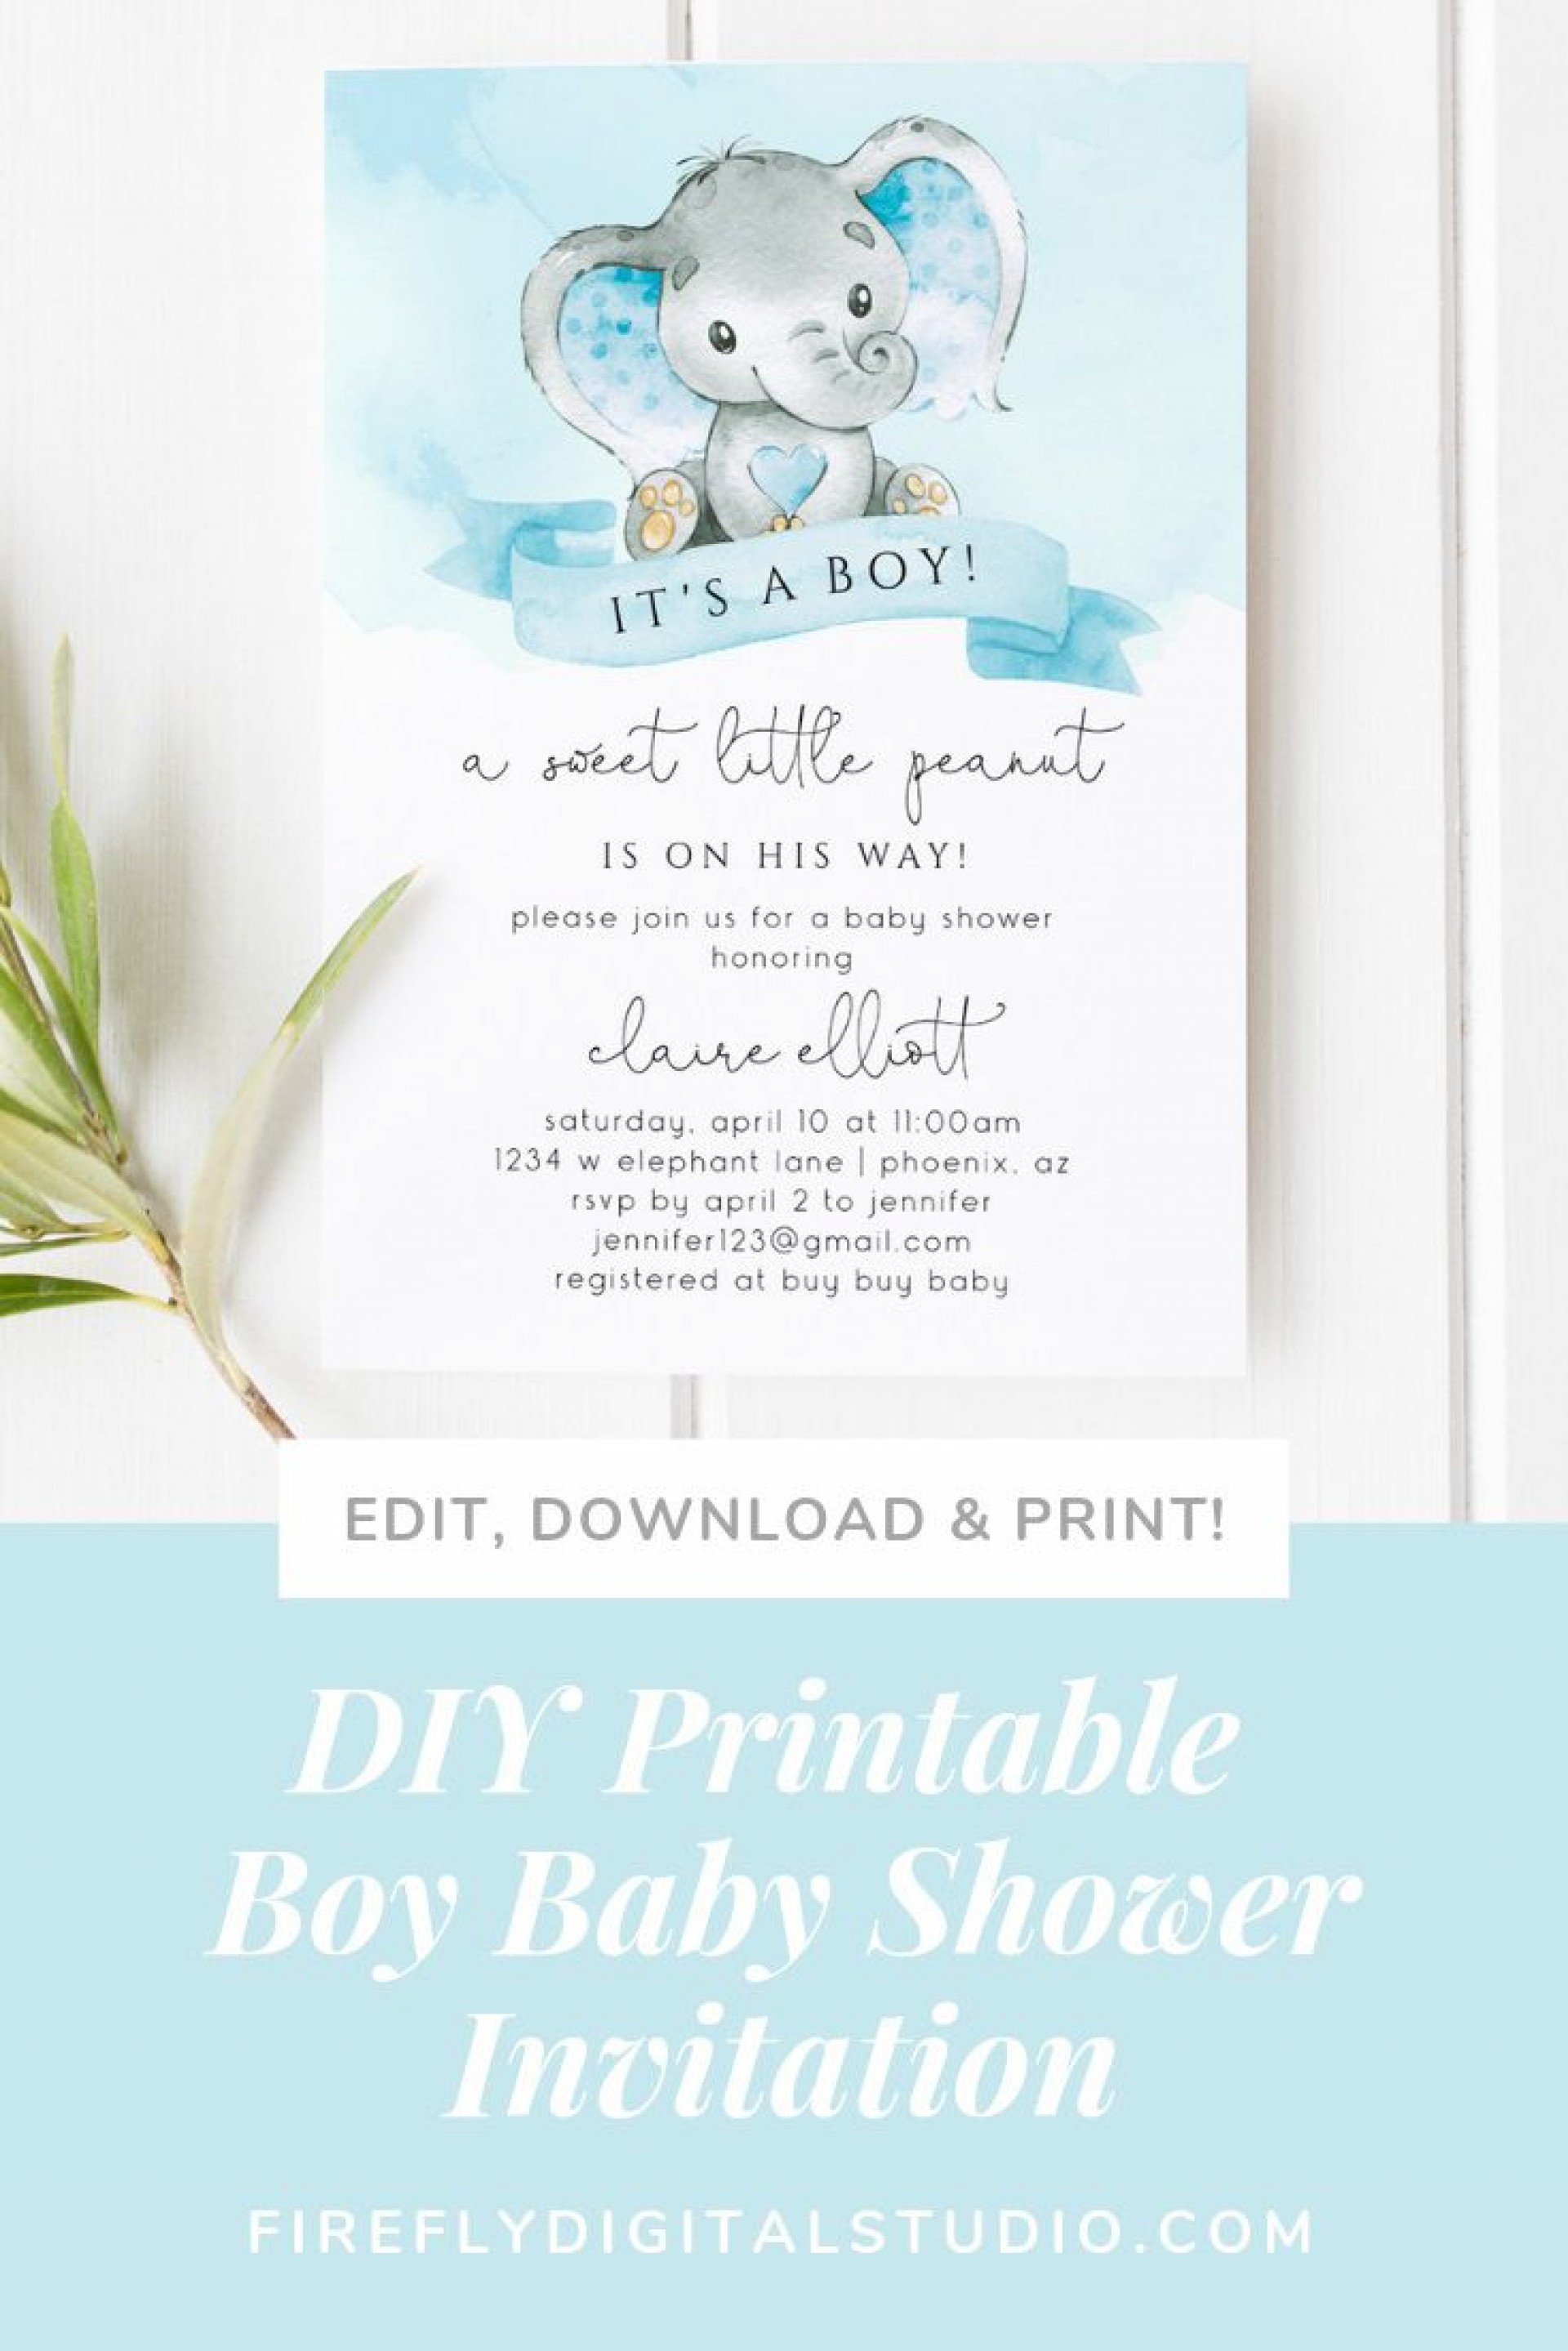 001 Wondrou Diy Baby Shower Invitation Template Inspiration  Templates Diaper1920